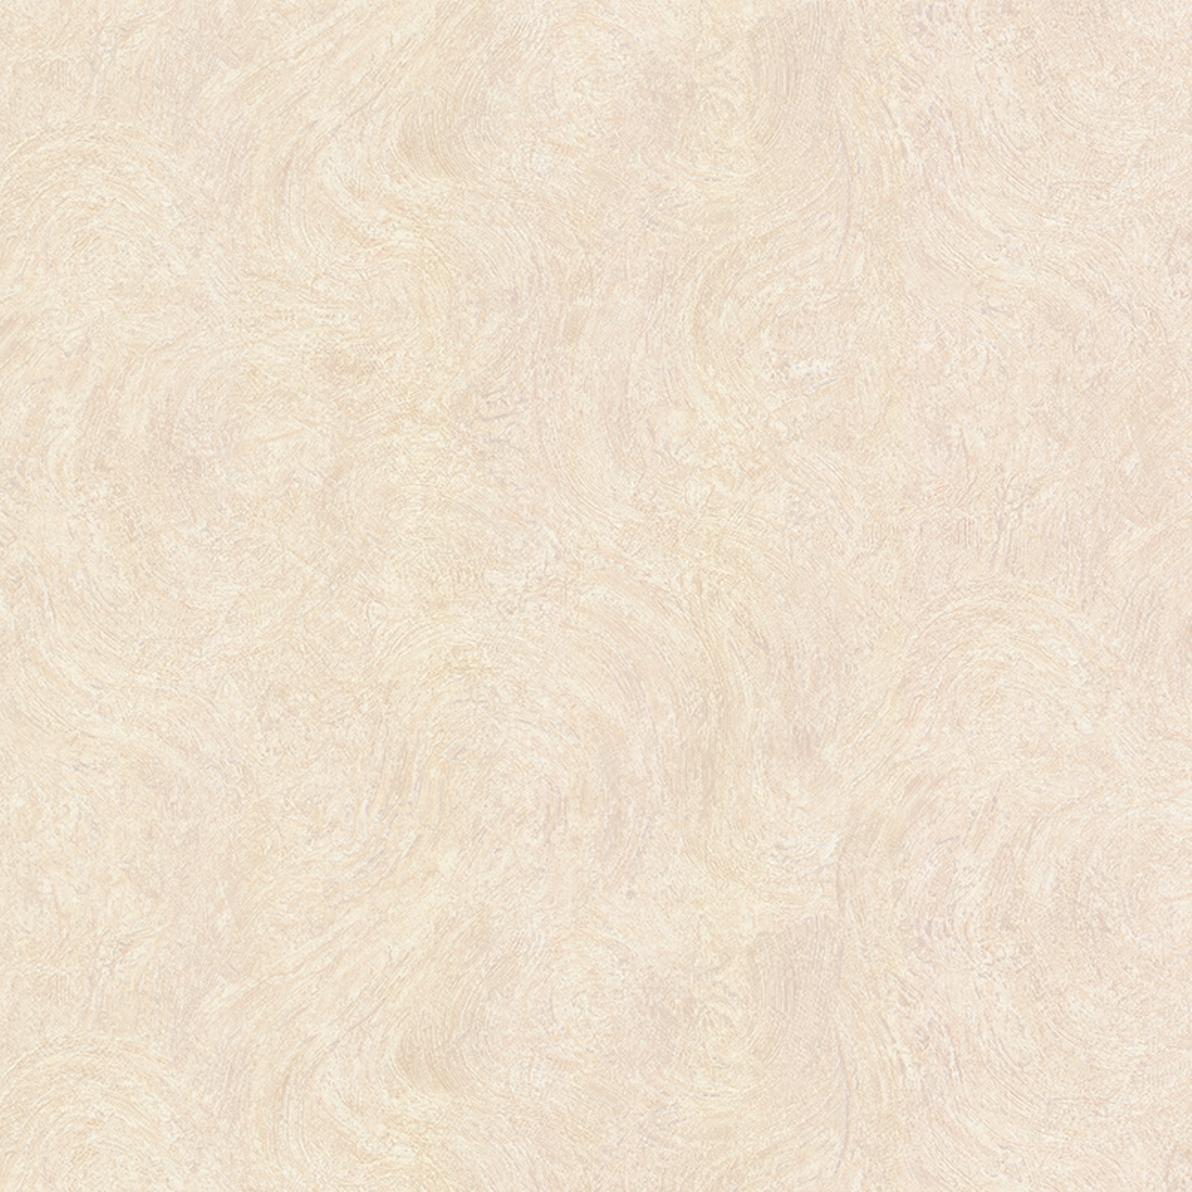 Обои Decori & Decori Bukhara 82720